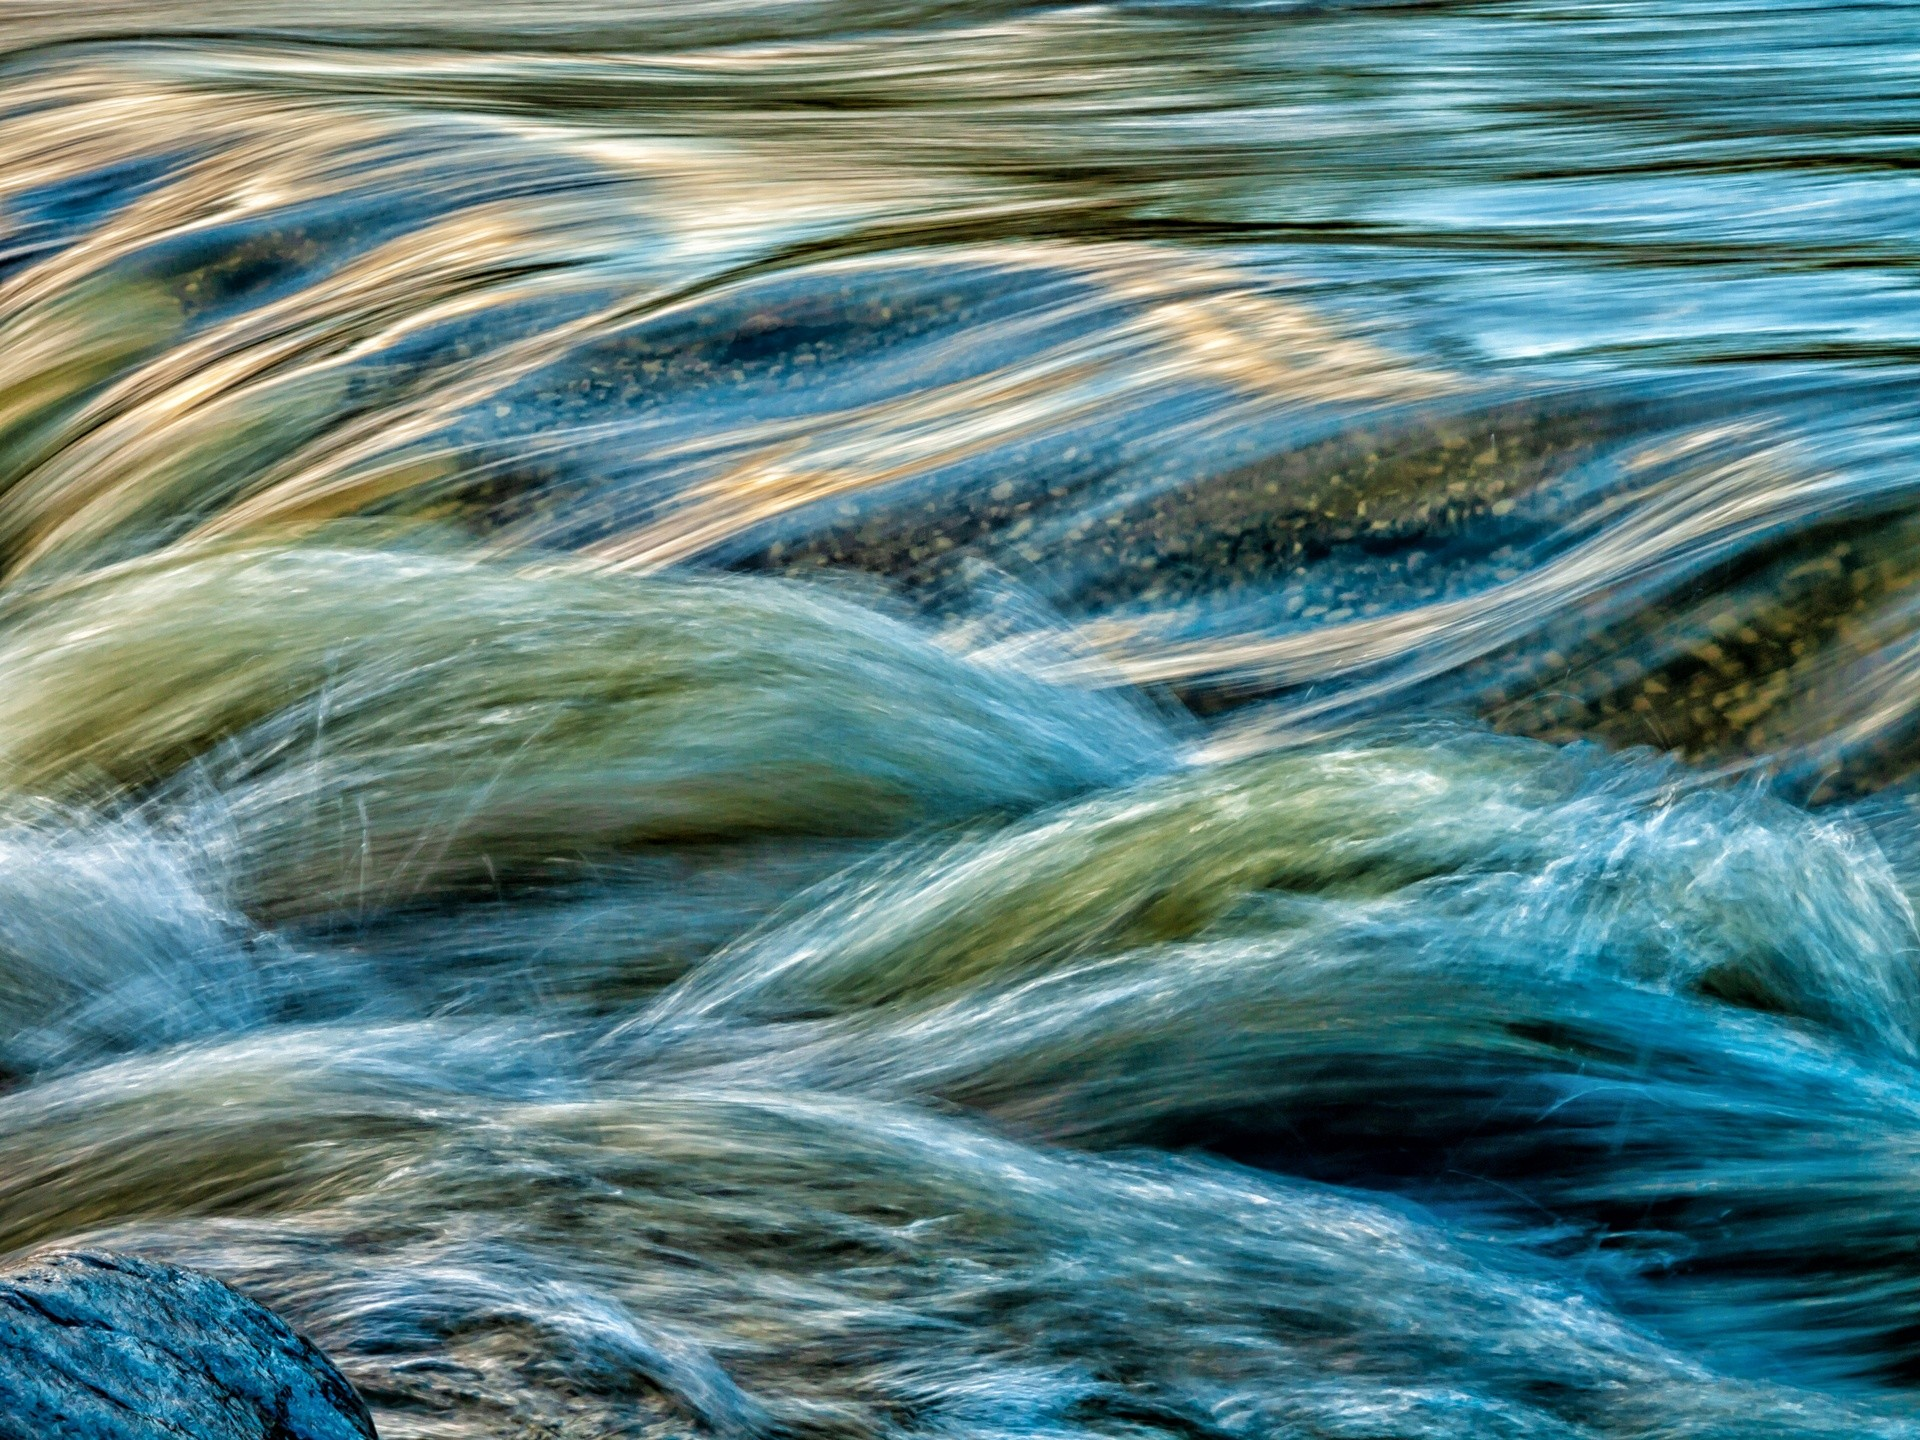 corriente de agua